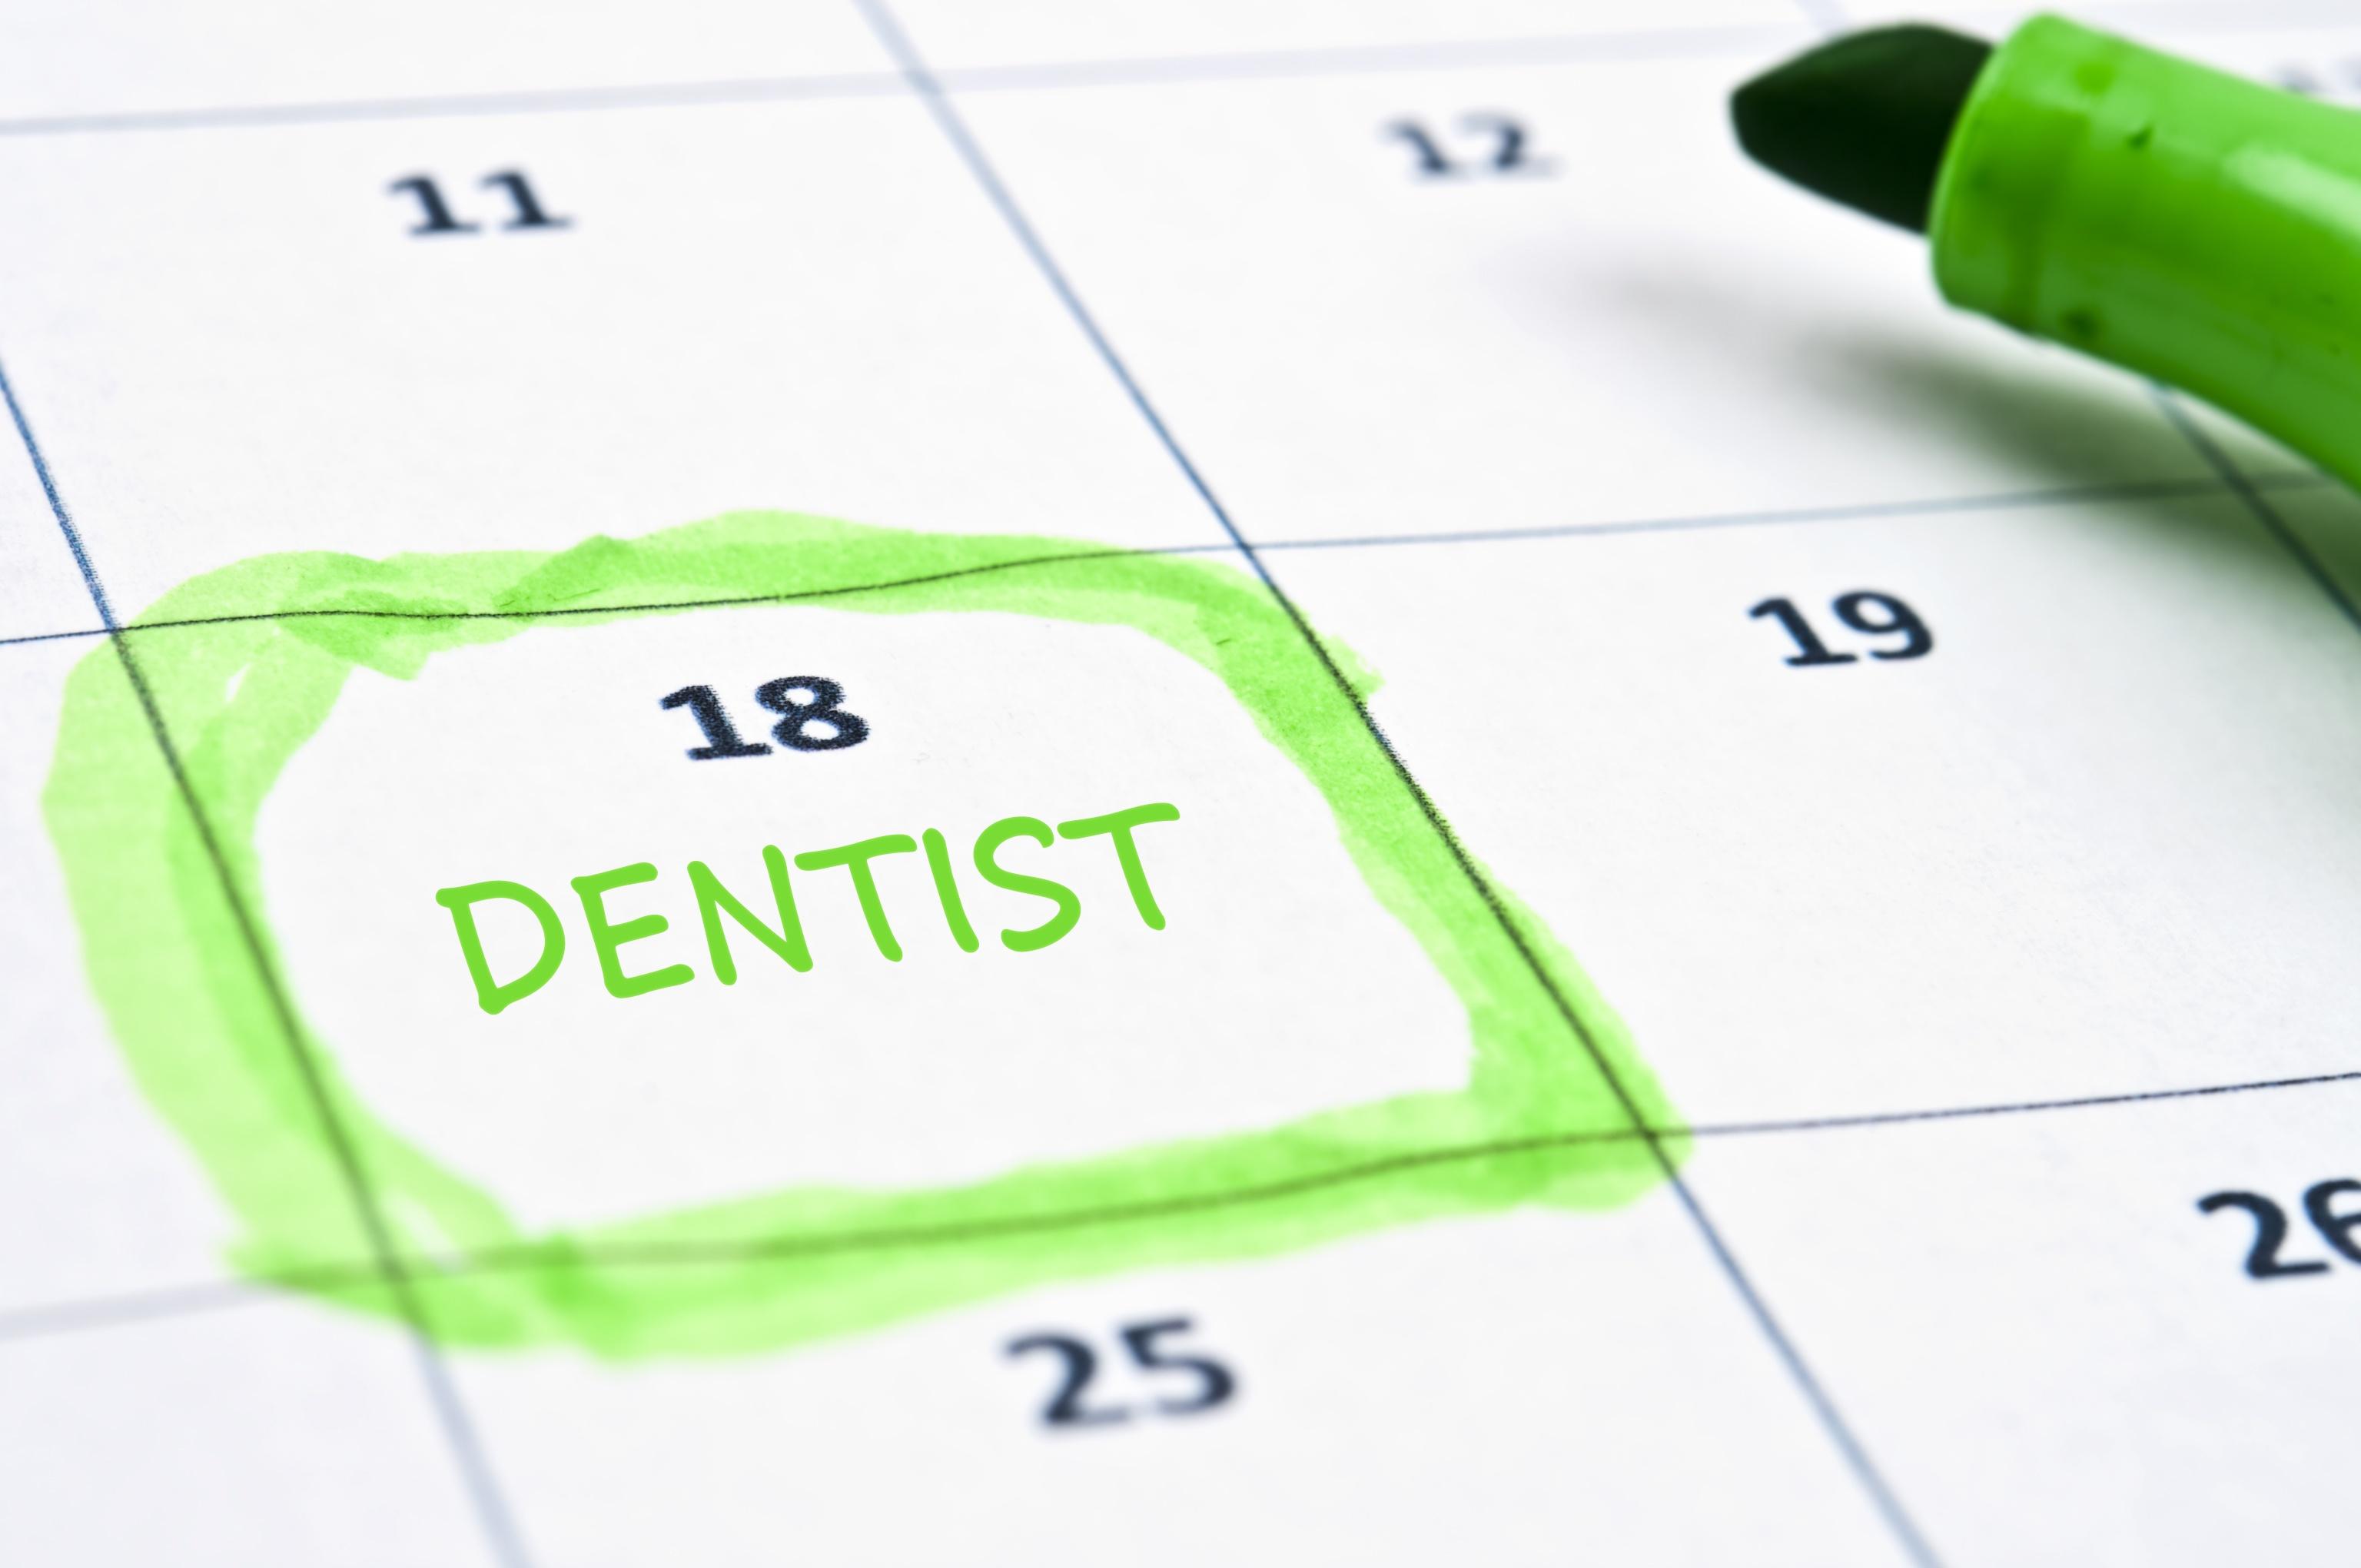 Family Dentist Ramapo